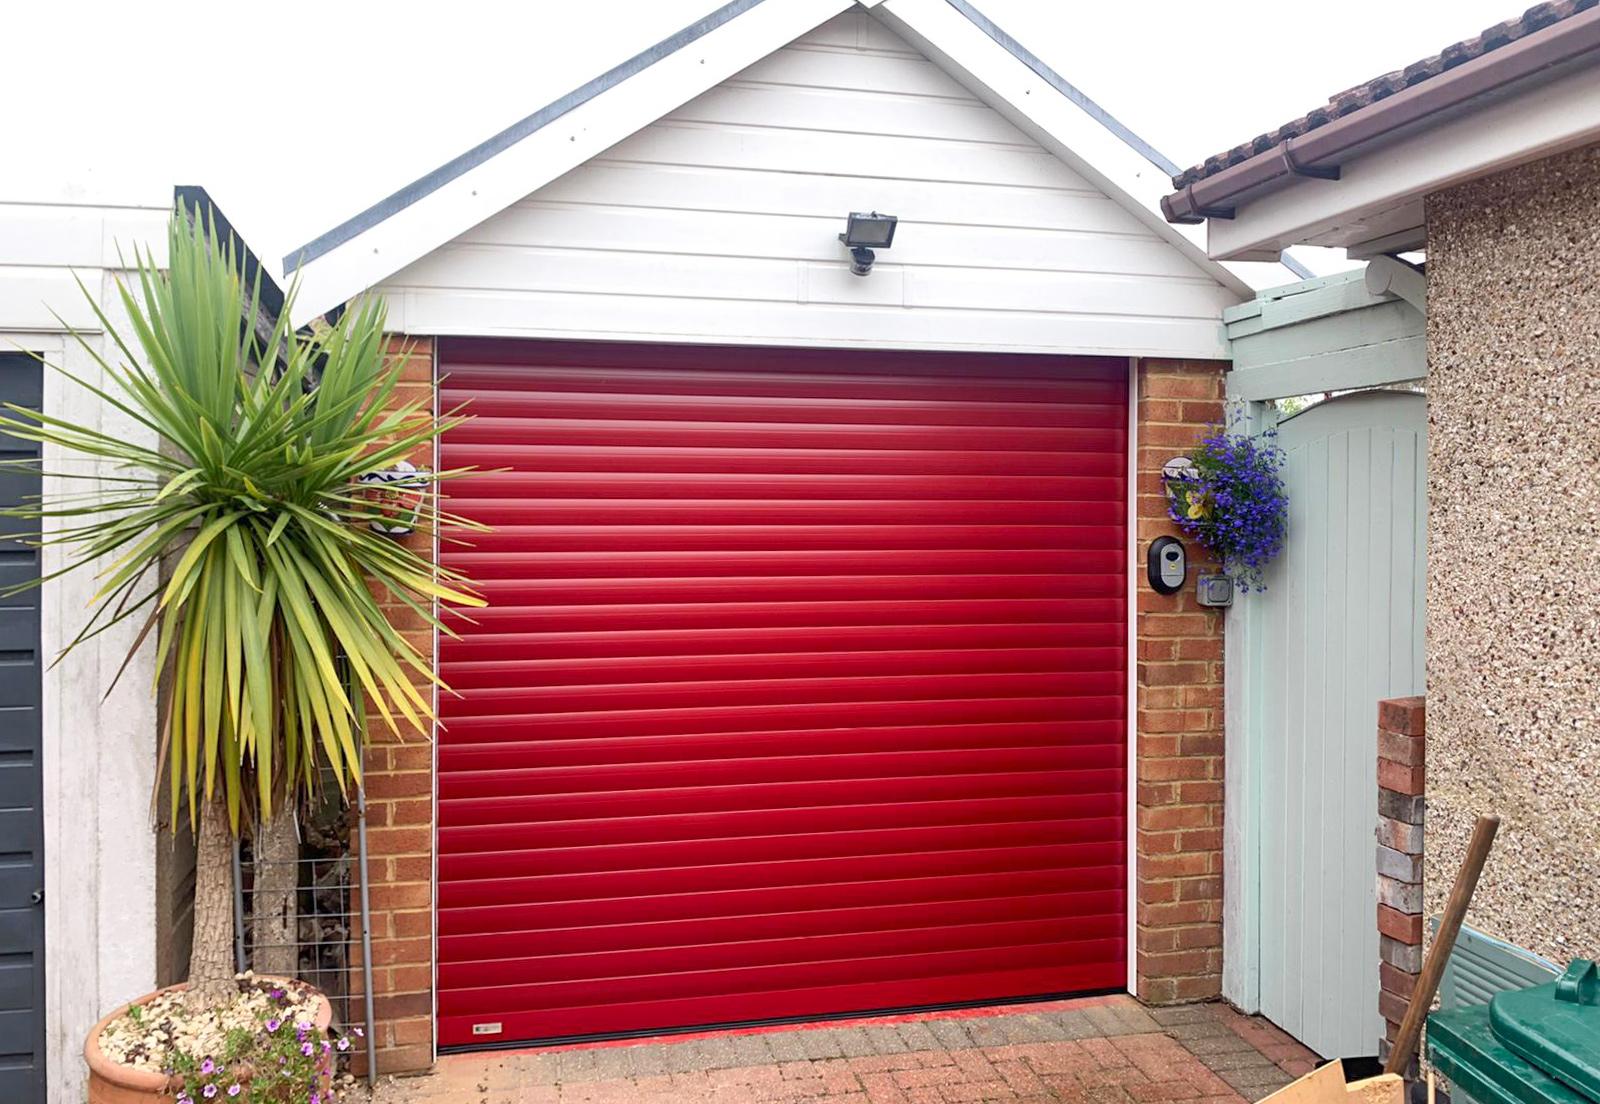 SWS Seceuroglide Roller Garage Door in Ruby Red